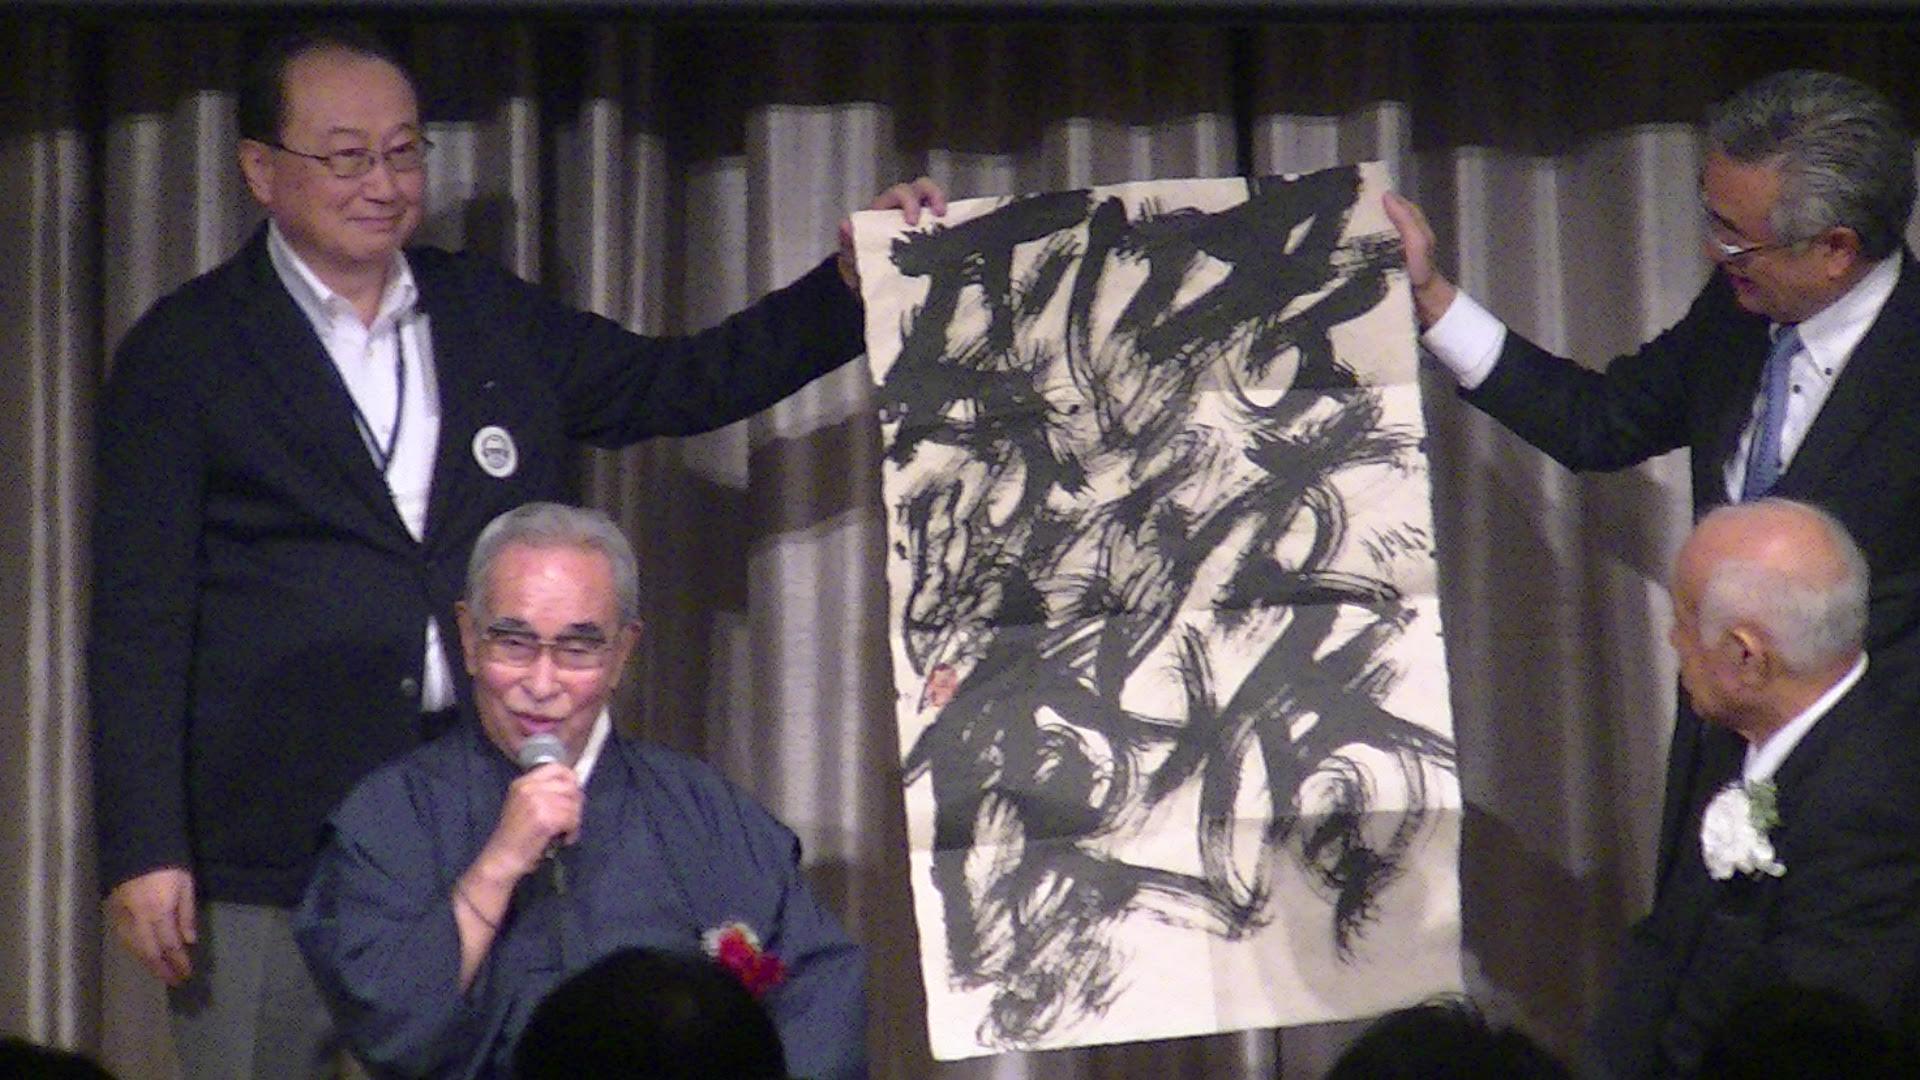 PIC 1803 1 - 思風会全国大会in広島